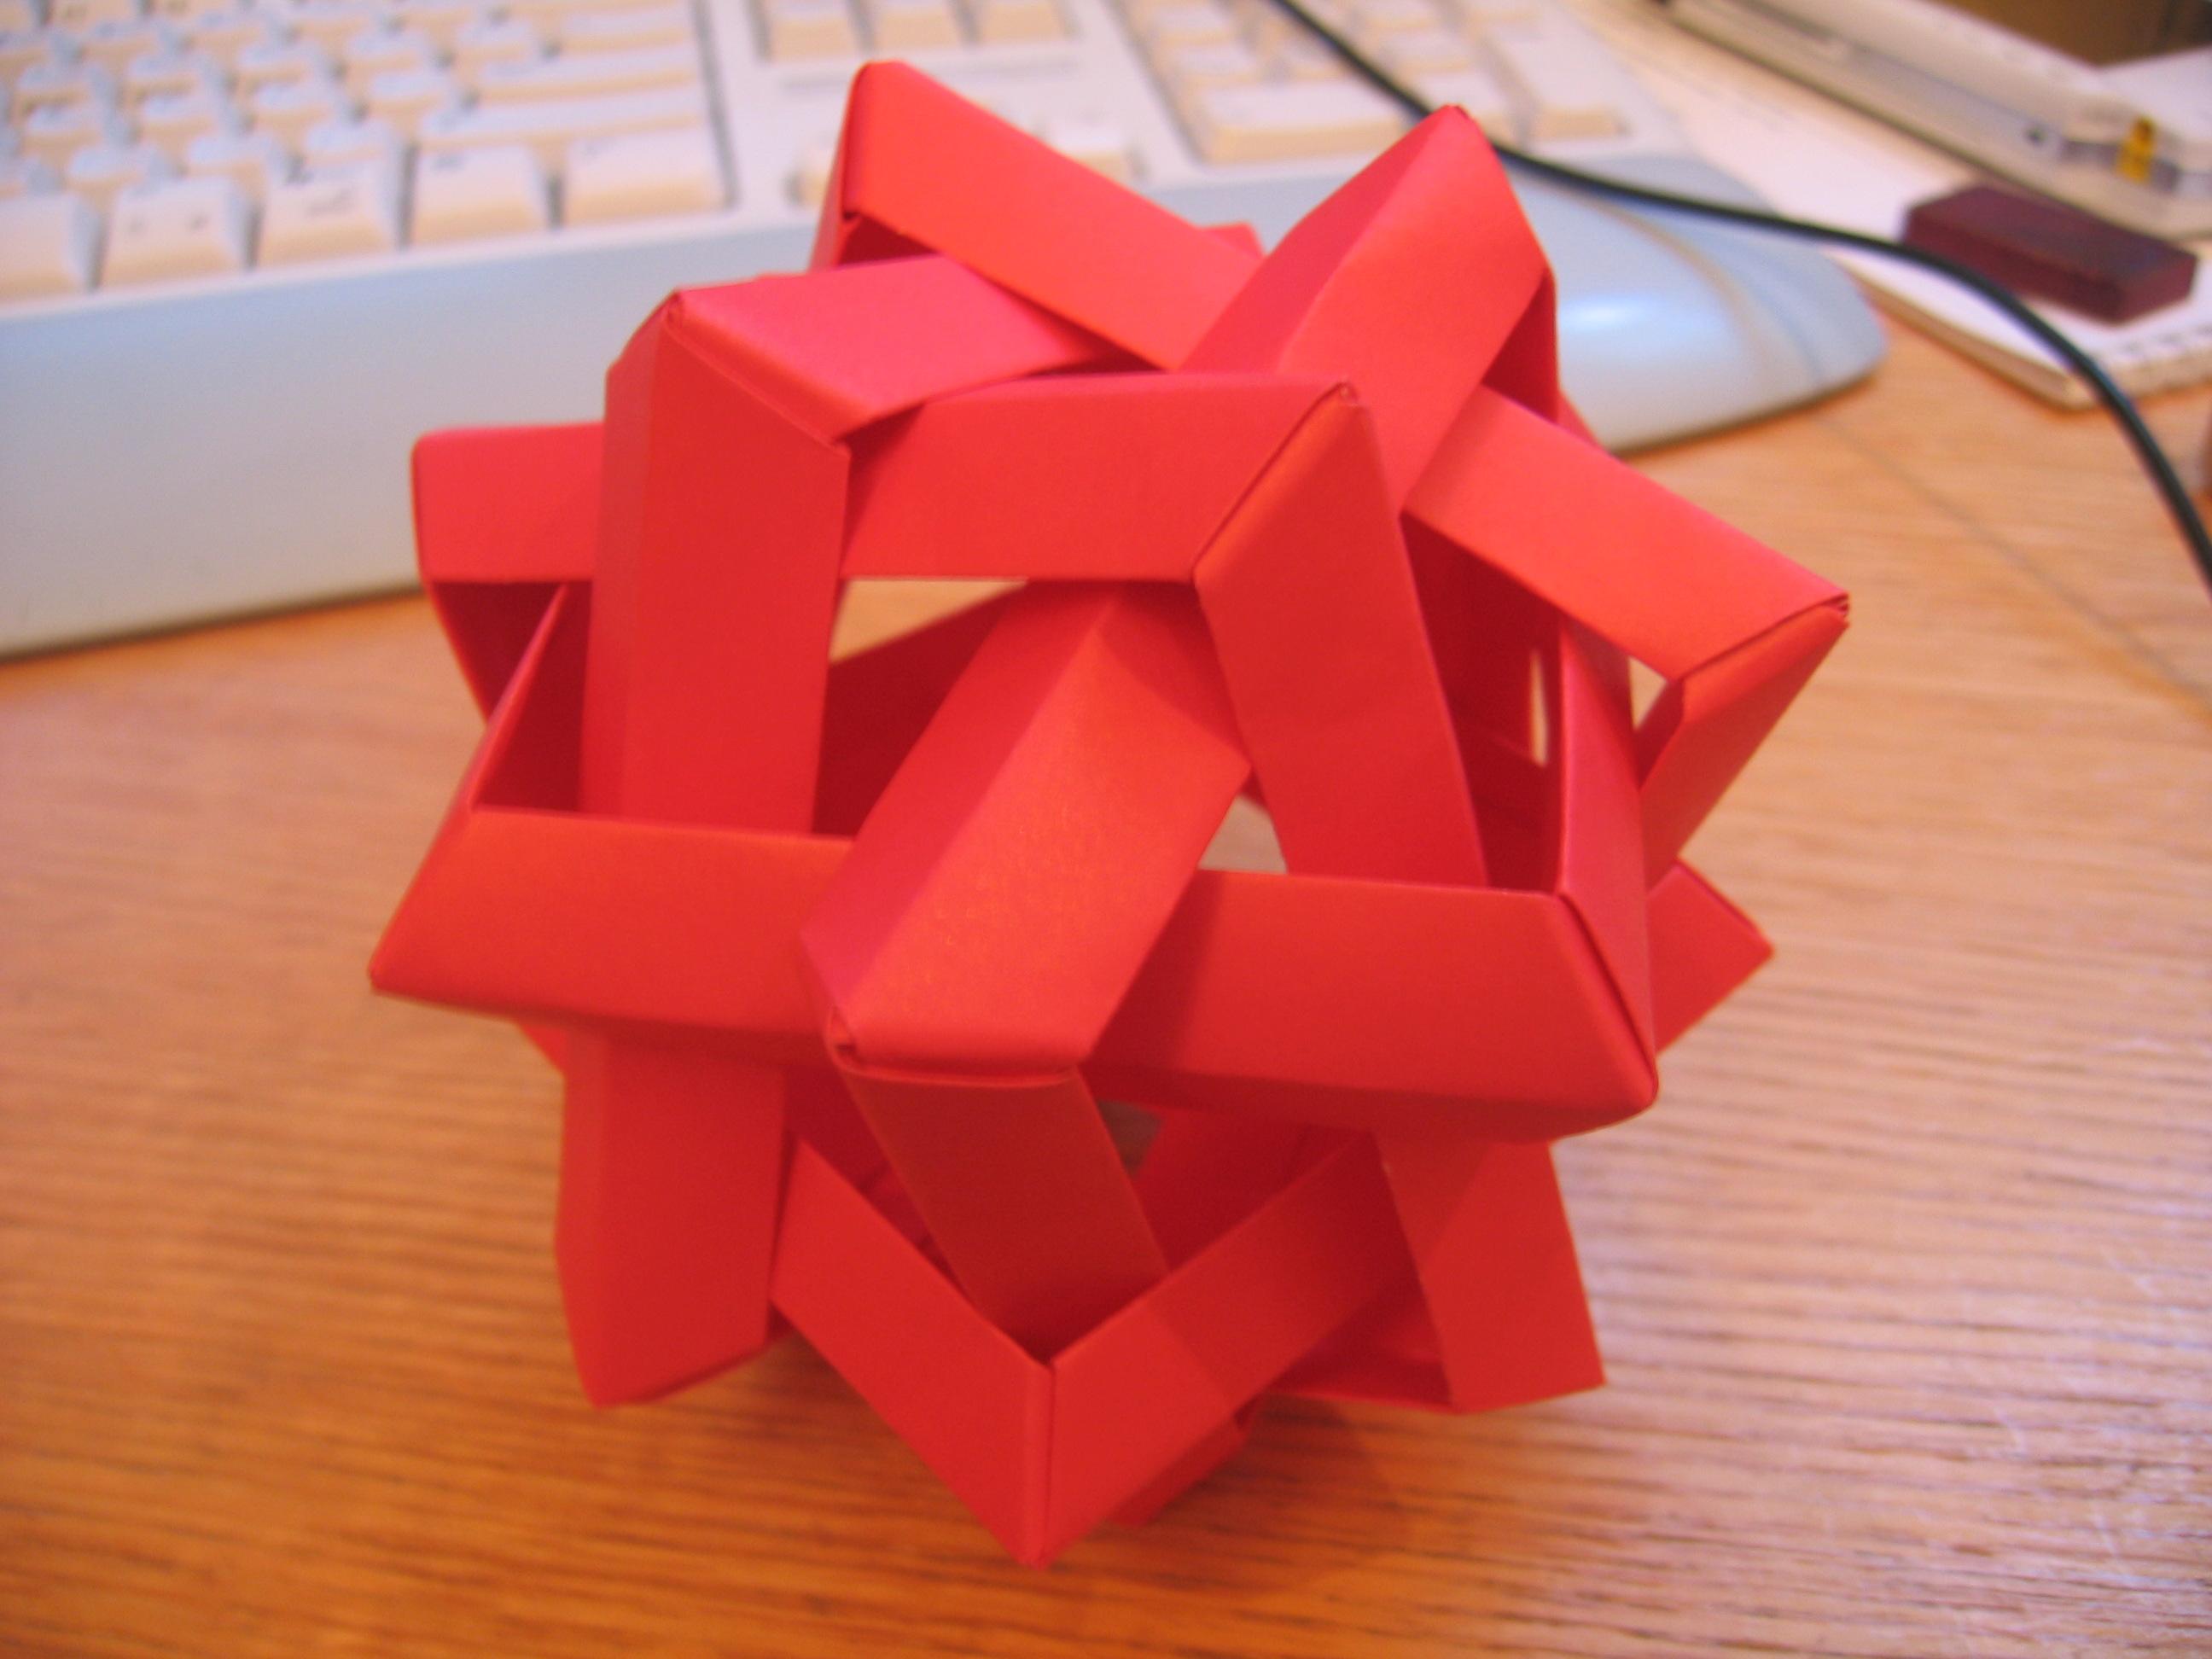 3D Origami Pokeball Diagram by pokegami on DeviantArt | 1944x2592